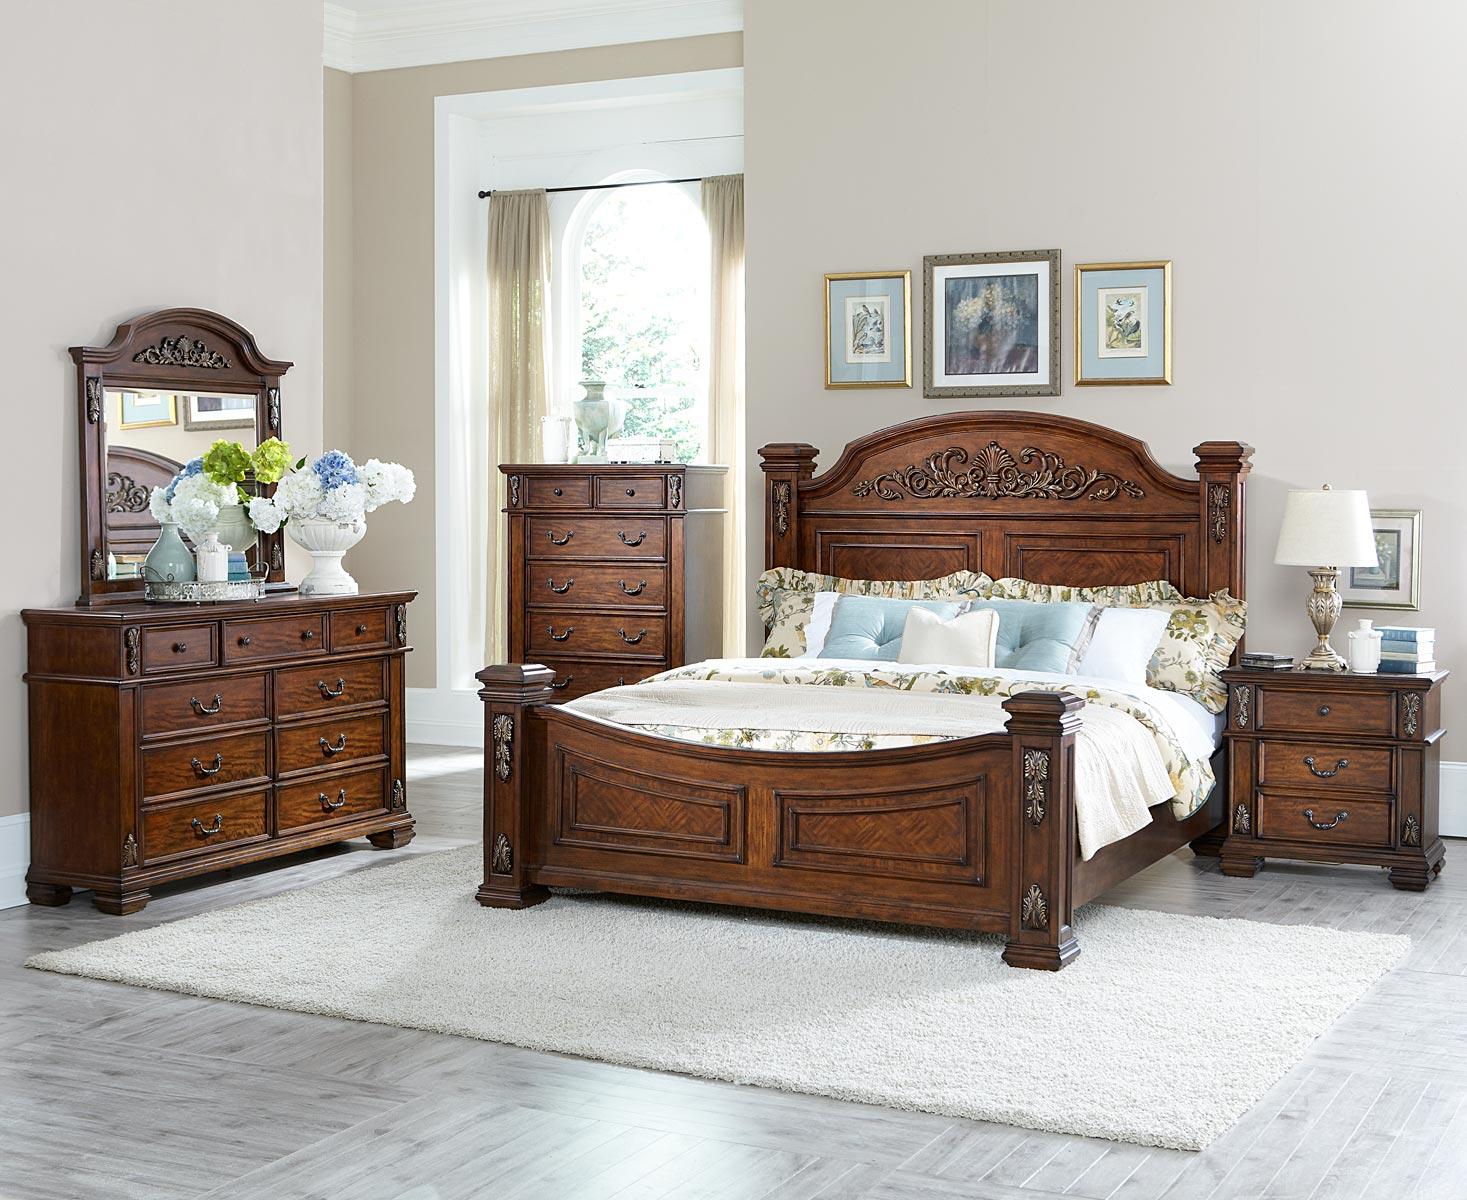 Homelegance Donata Falls Bedroom Set - Warm Brown